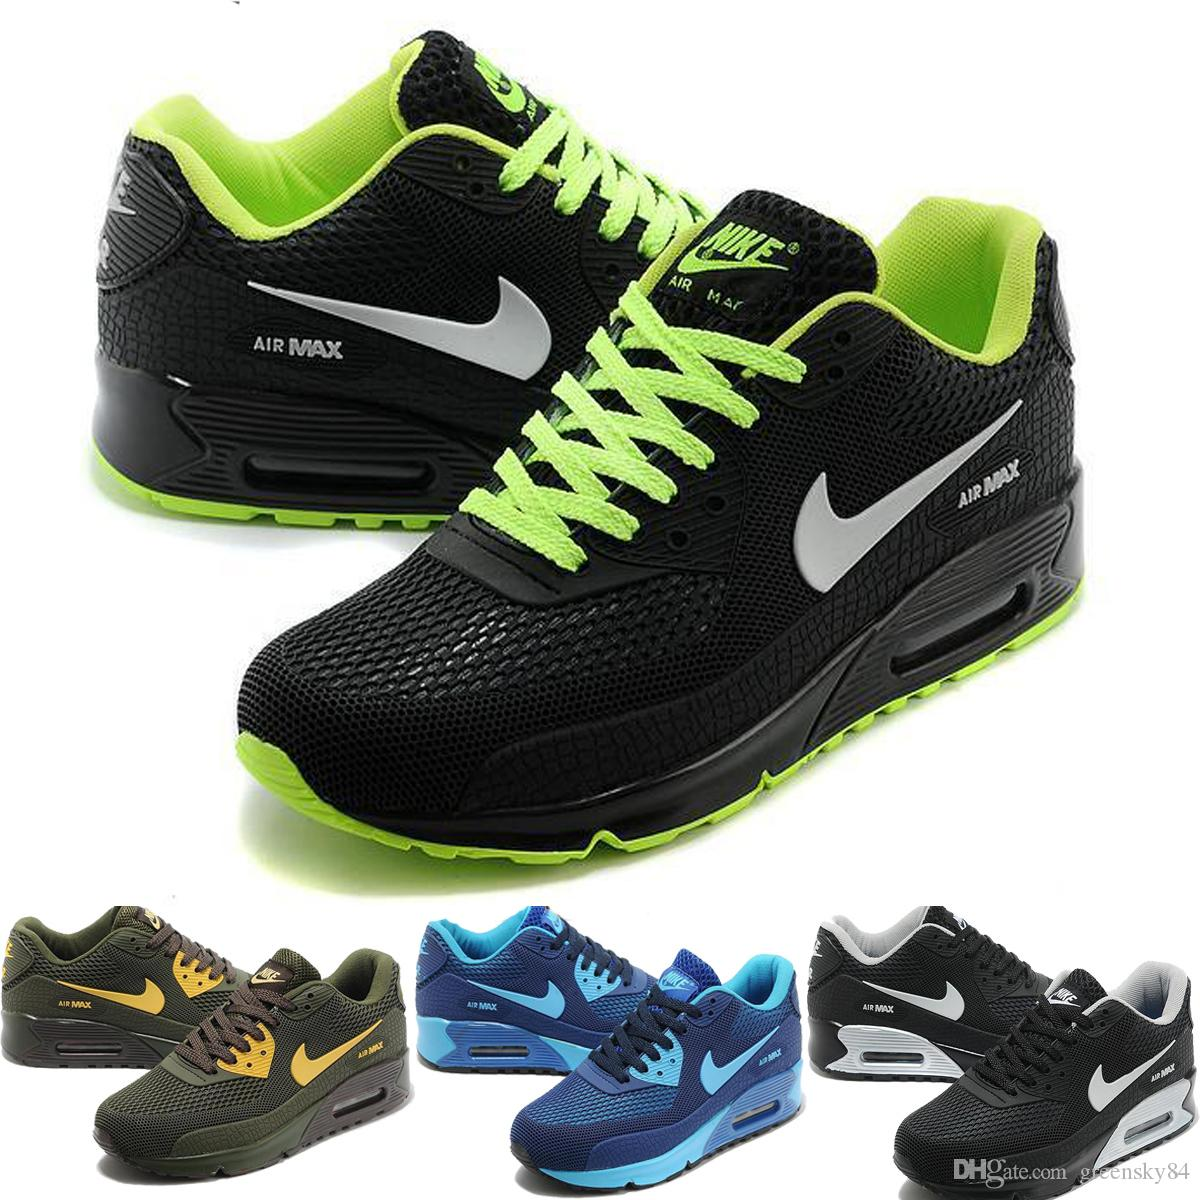 b2b494be05 ... nike air max 90 kpu runing shoes for men,wholesale cheap original nike  airmax cow